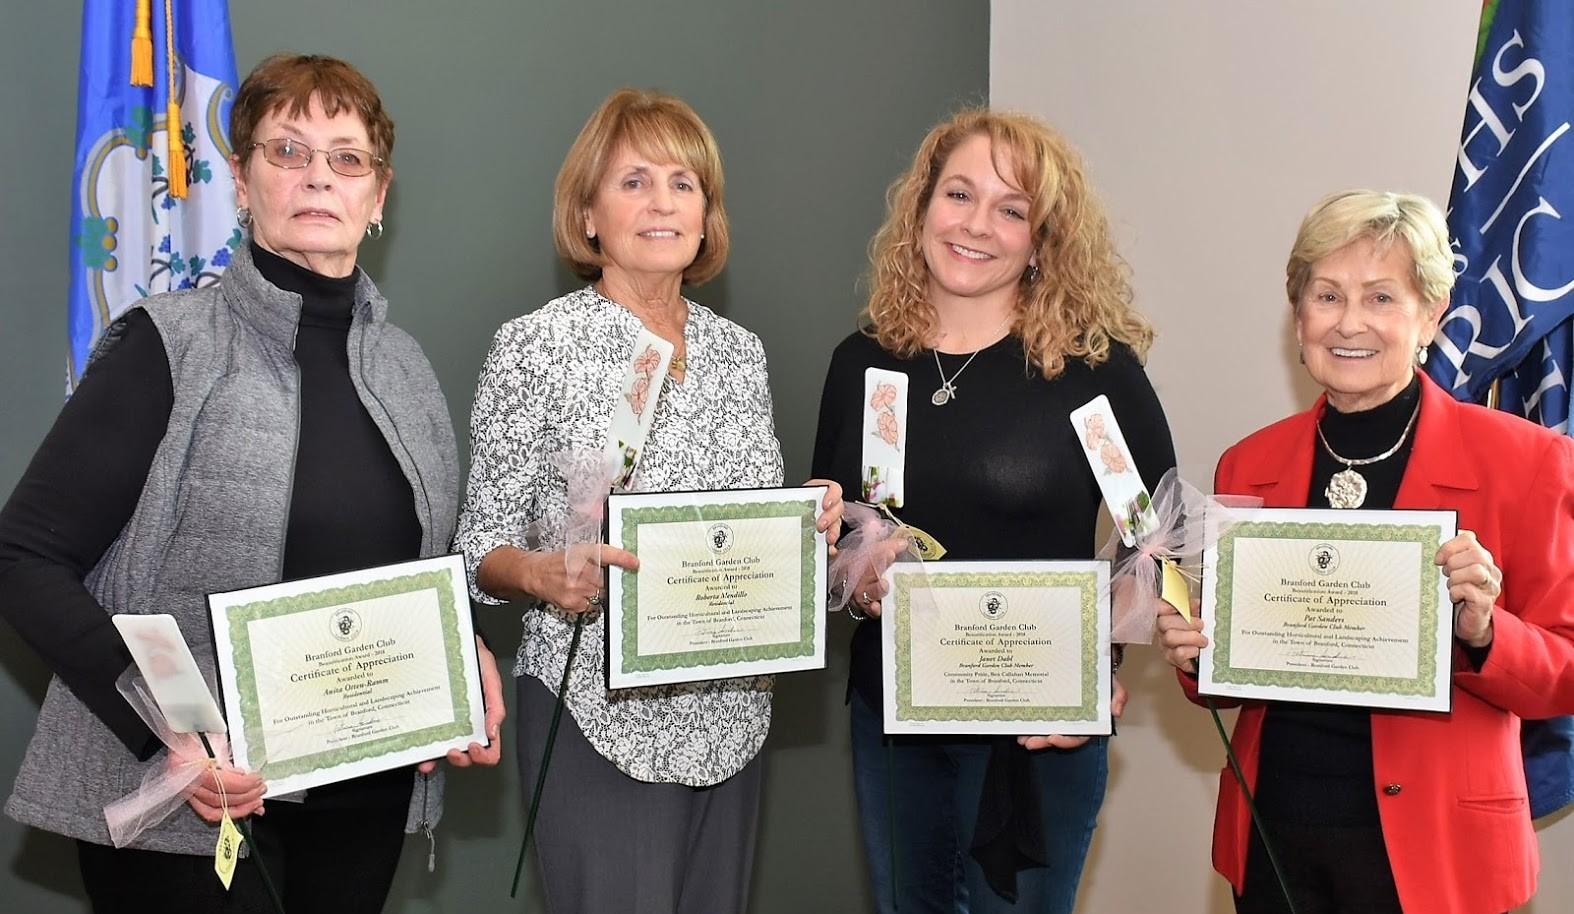 The Winners: Anita Otten-Ramm, Roberta Mendillo, Janet Dahl, Pat Sanders